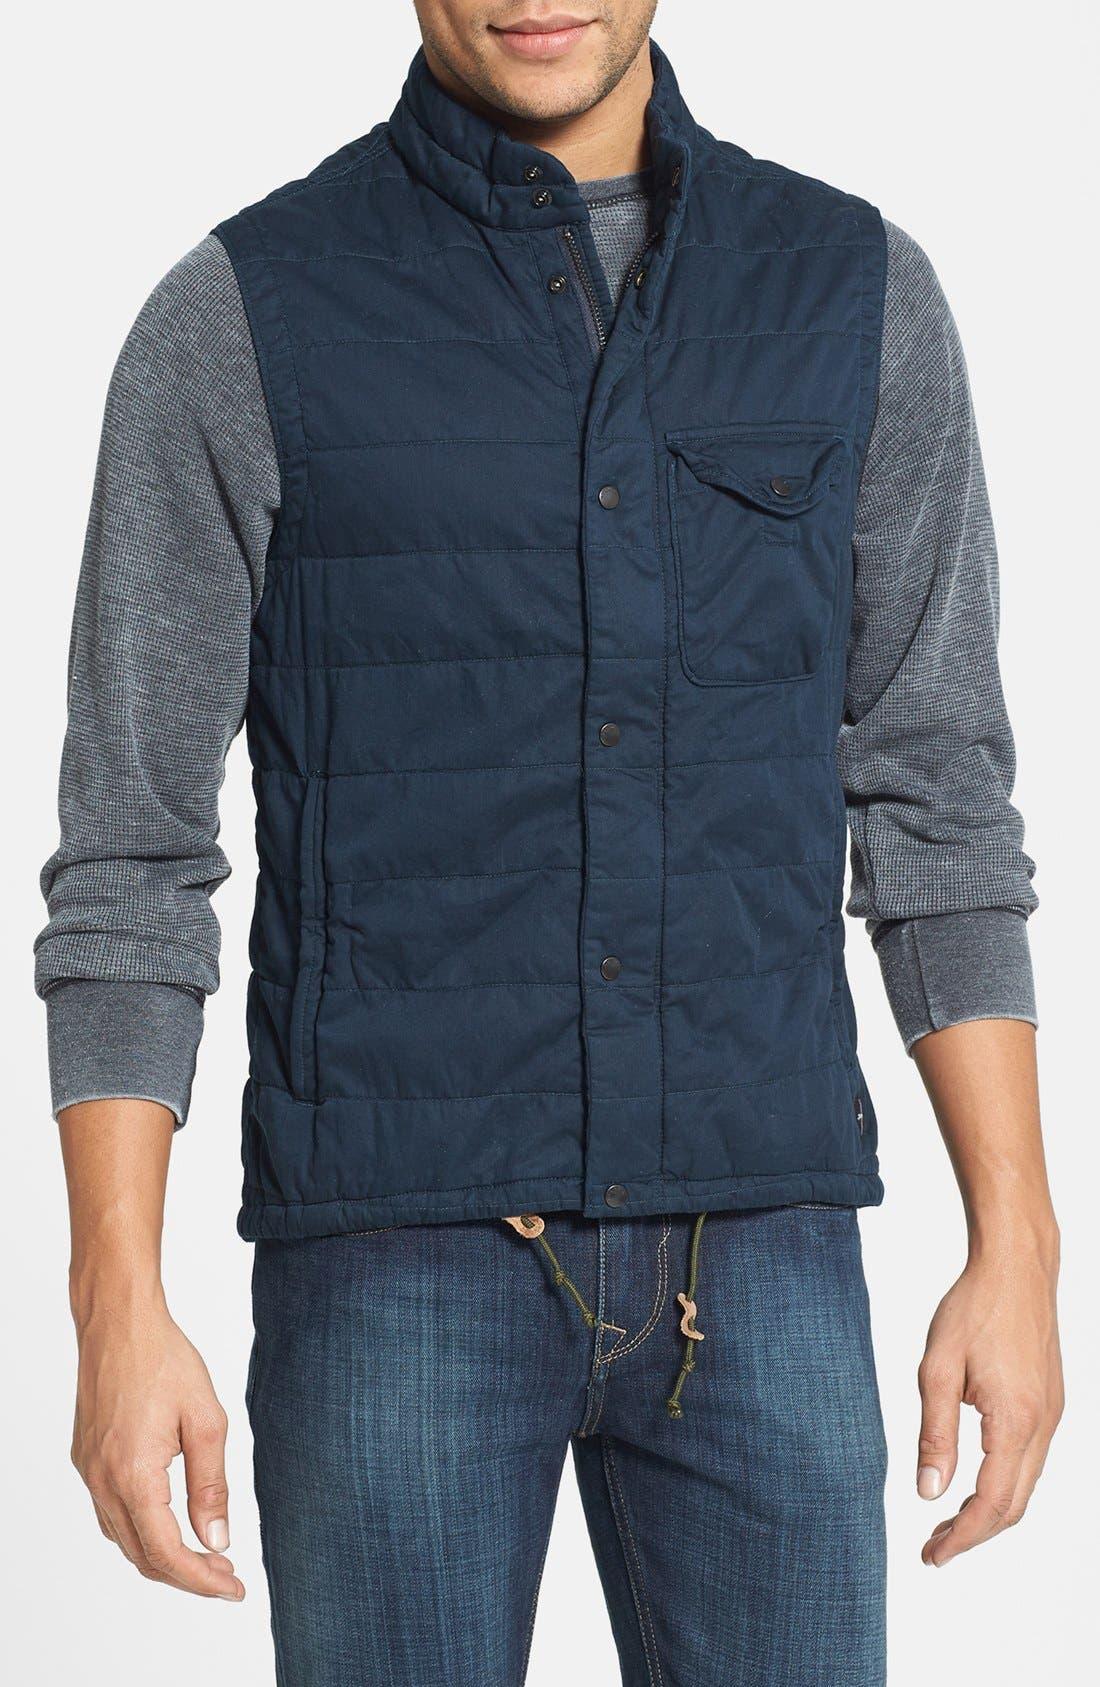 Main Image - Relwen 'Flyweight' Cotton Twill Vest